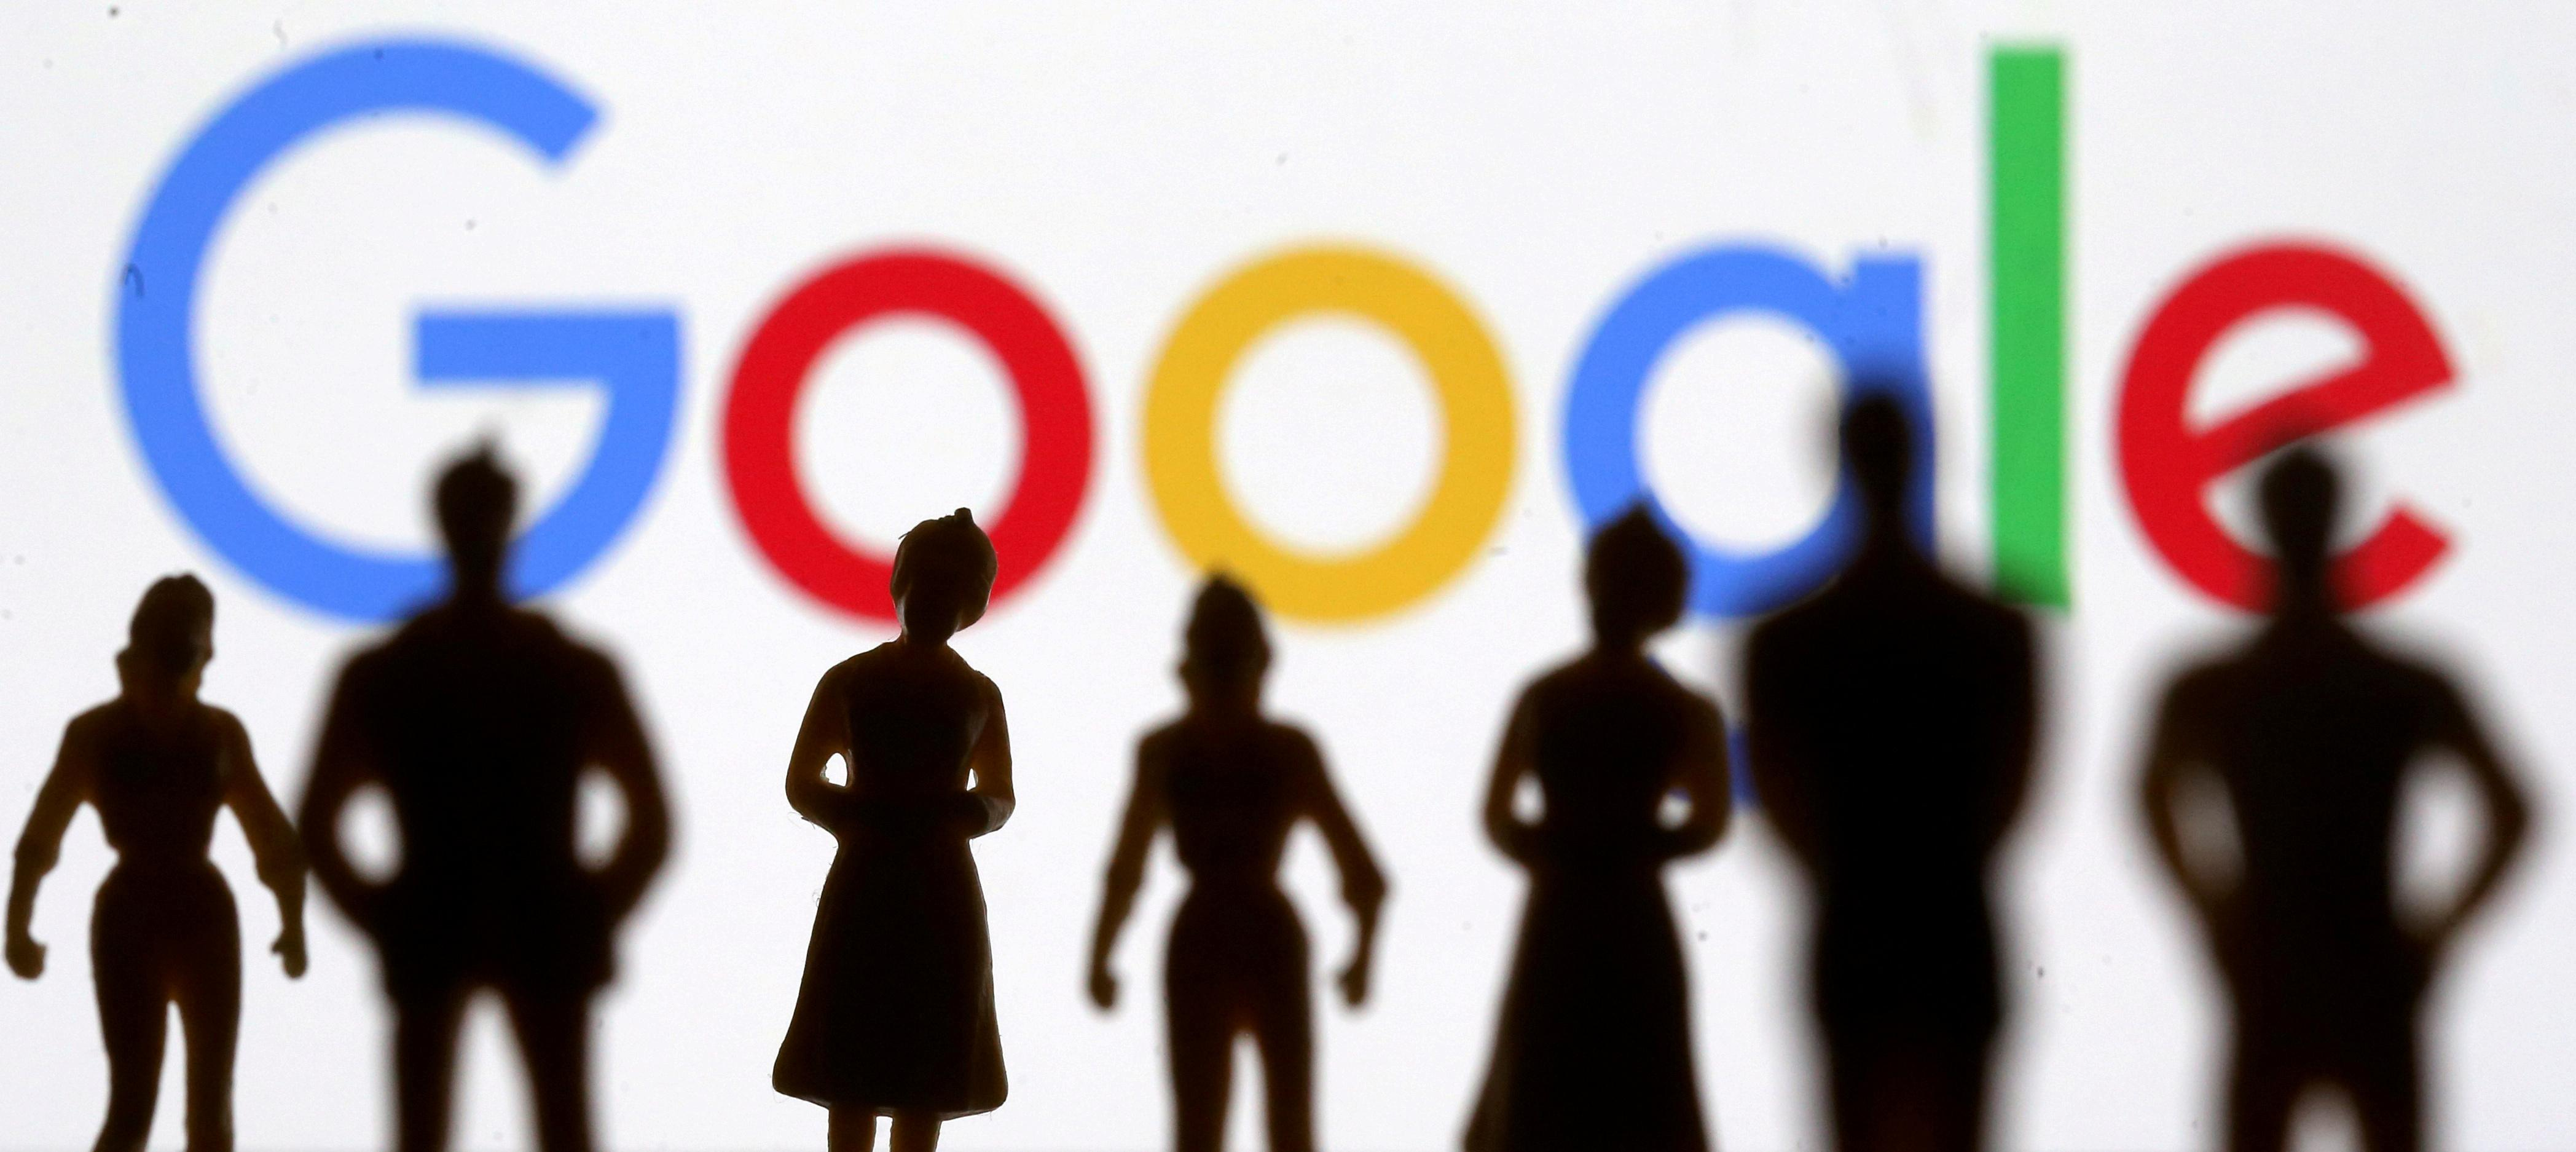 Google enables debit card payments in Brazil